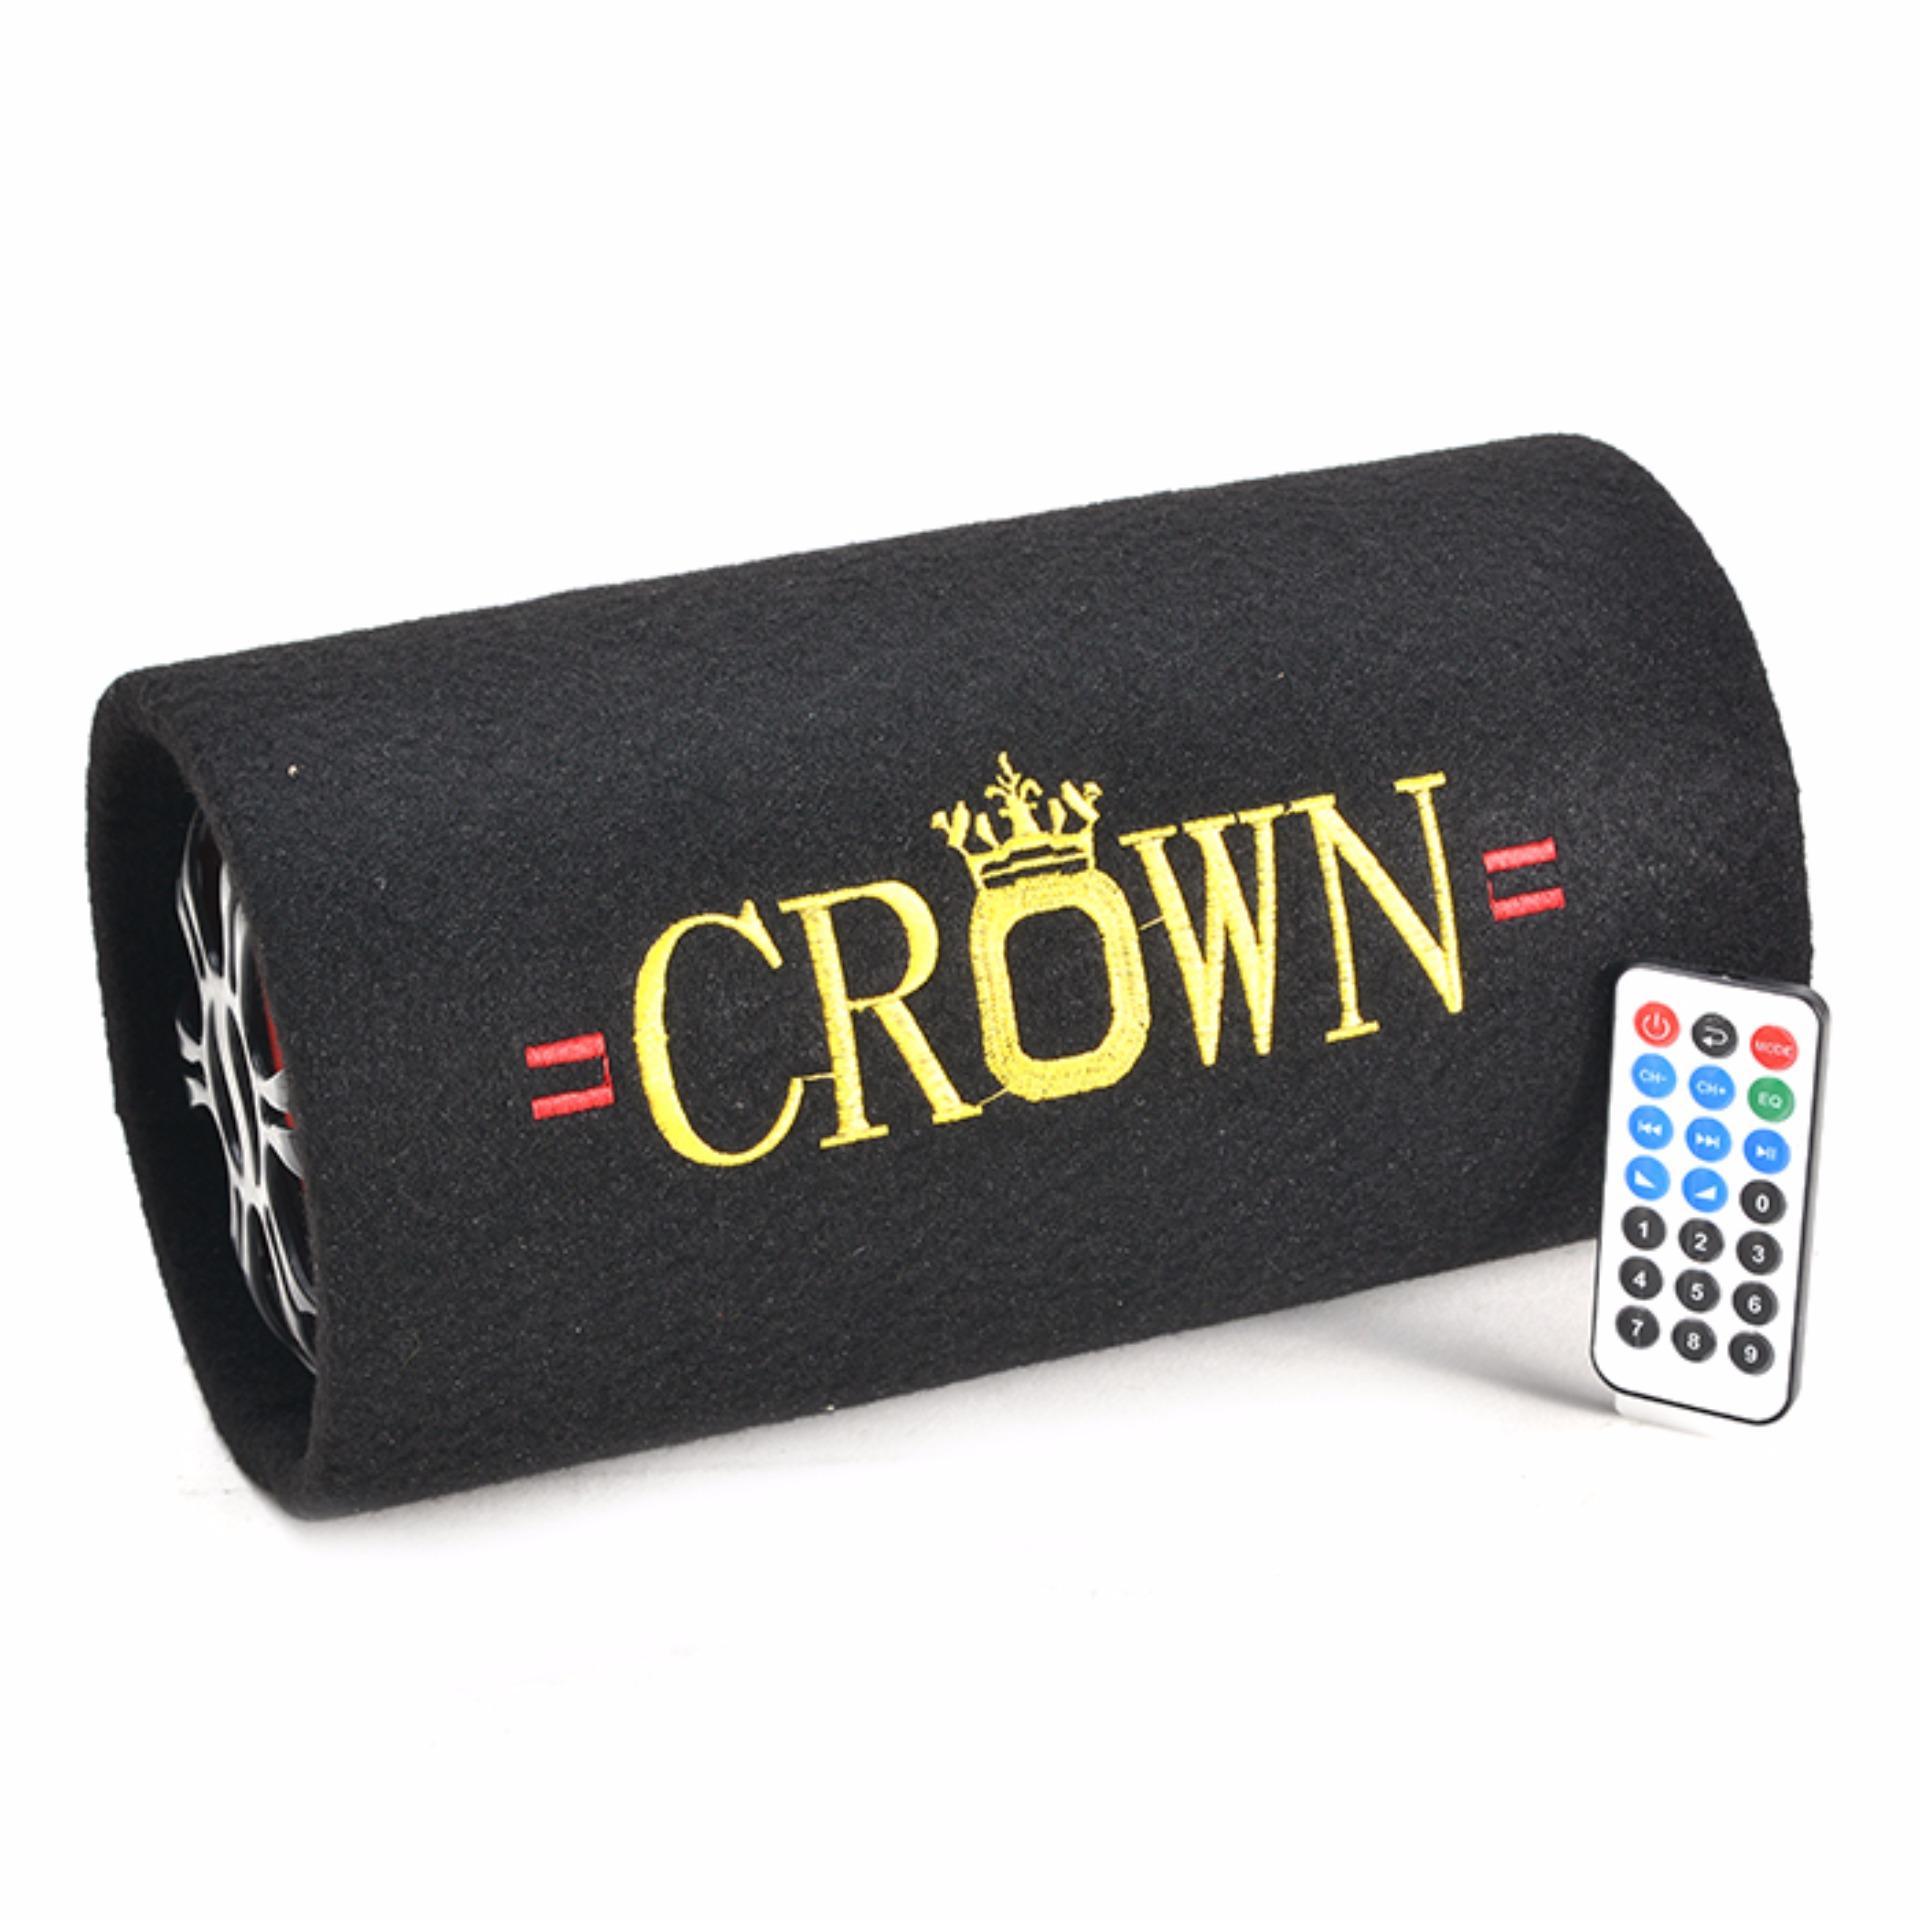 loa-cam-the-nho-usb-crown-5-de-tron-1483695226-0516263-73509d9f8ca68823bcd081c6cf1a06db.jpg (1920×1920)